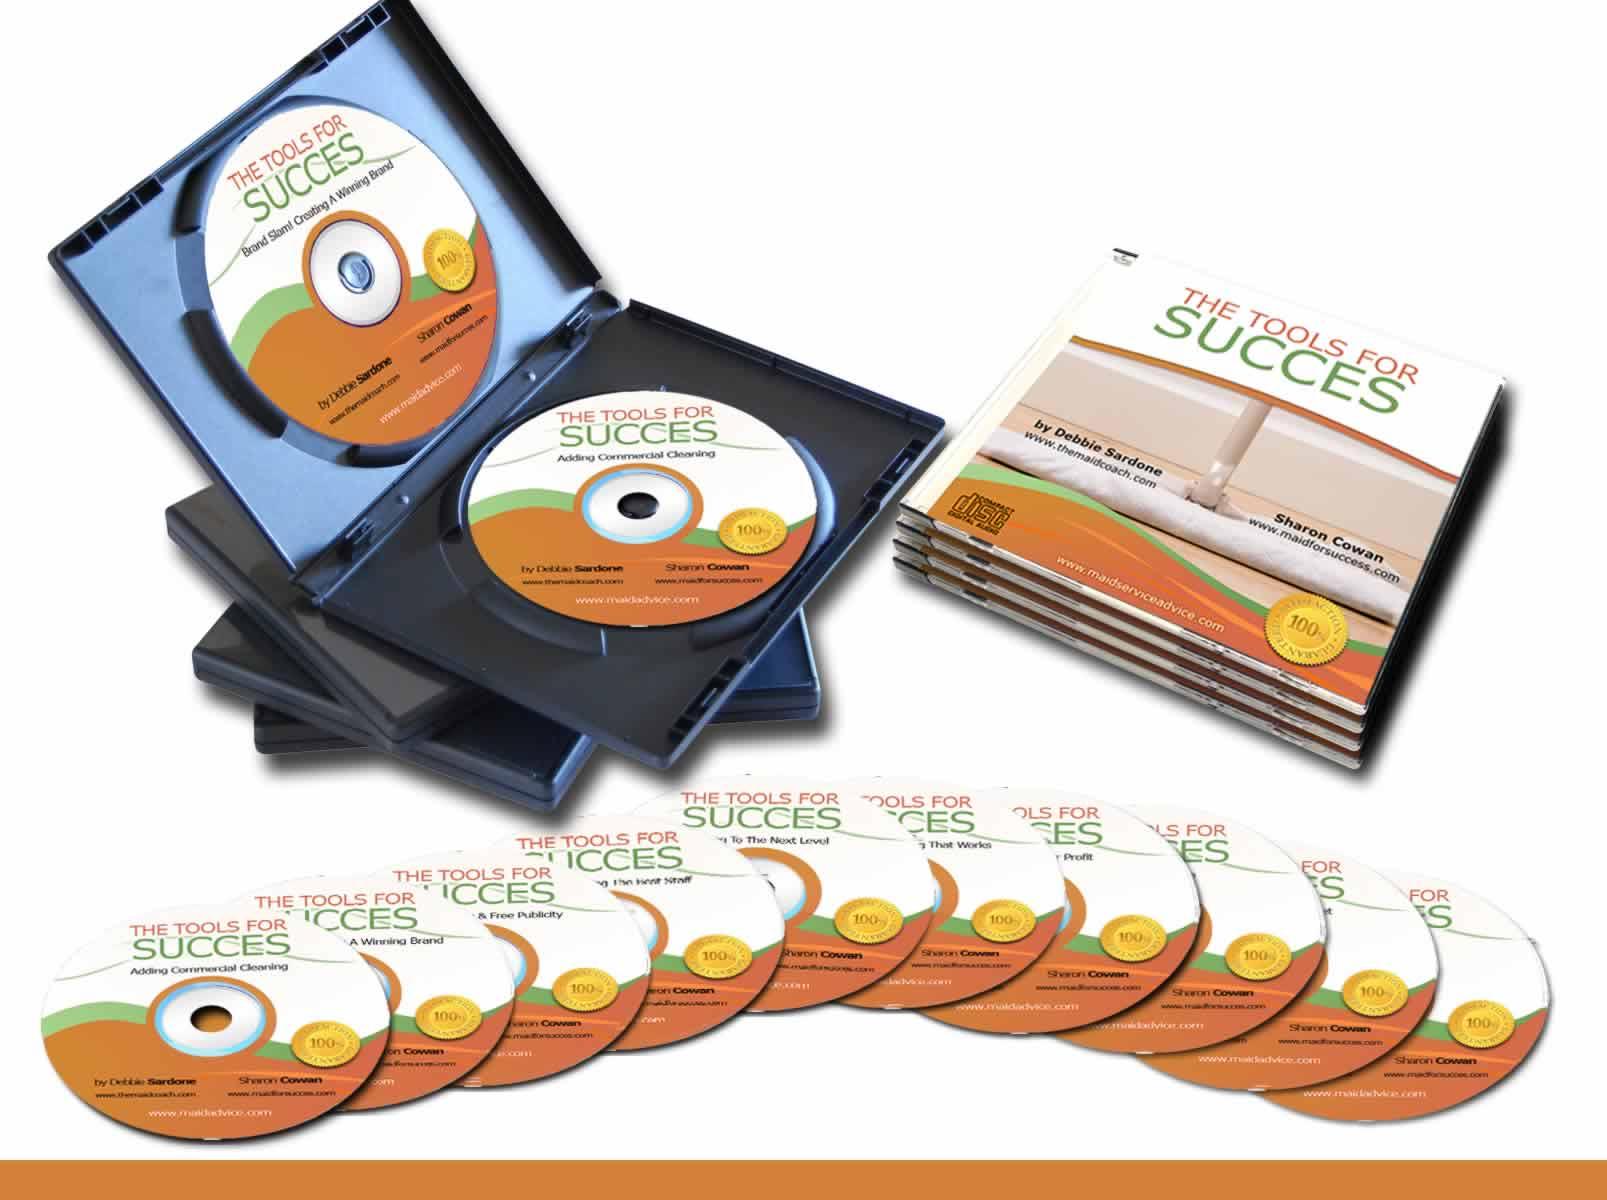 چاپ dvd و اثر تبلیغات